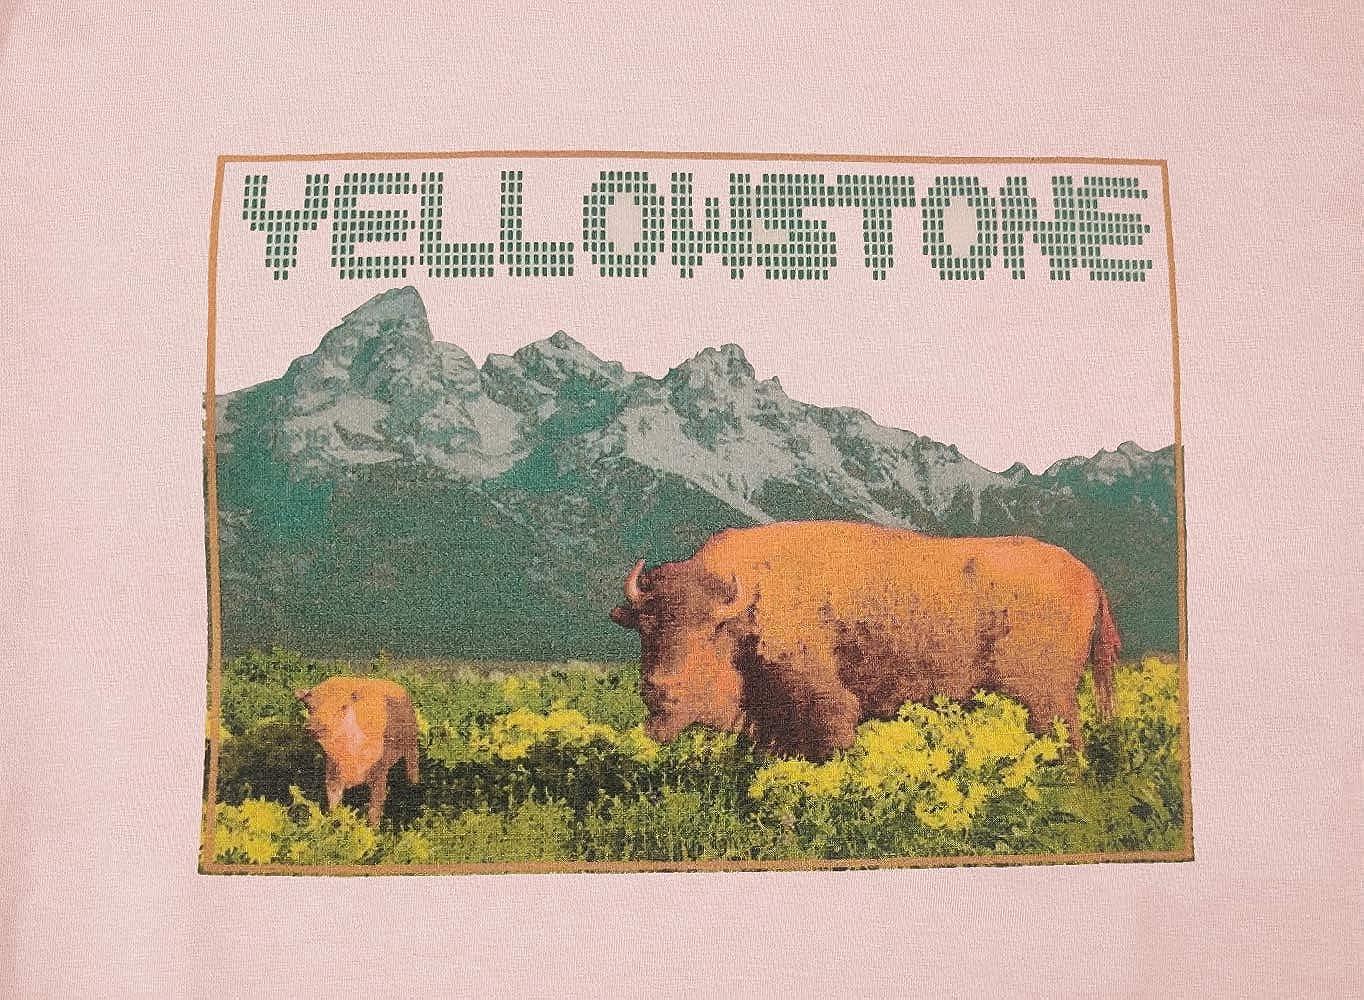 Yellow Stone National Peak Shirt Women Funny Bear Sing Graphic Tees Tops Casual Camping Shirt Vacation Shirt Hike Shirt